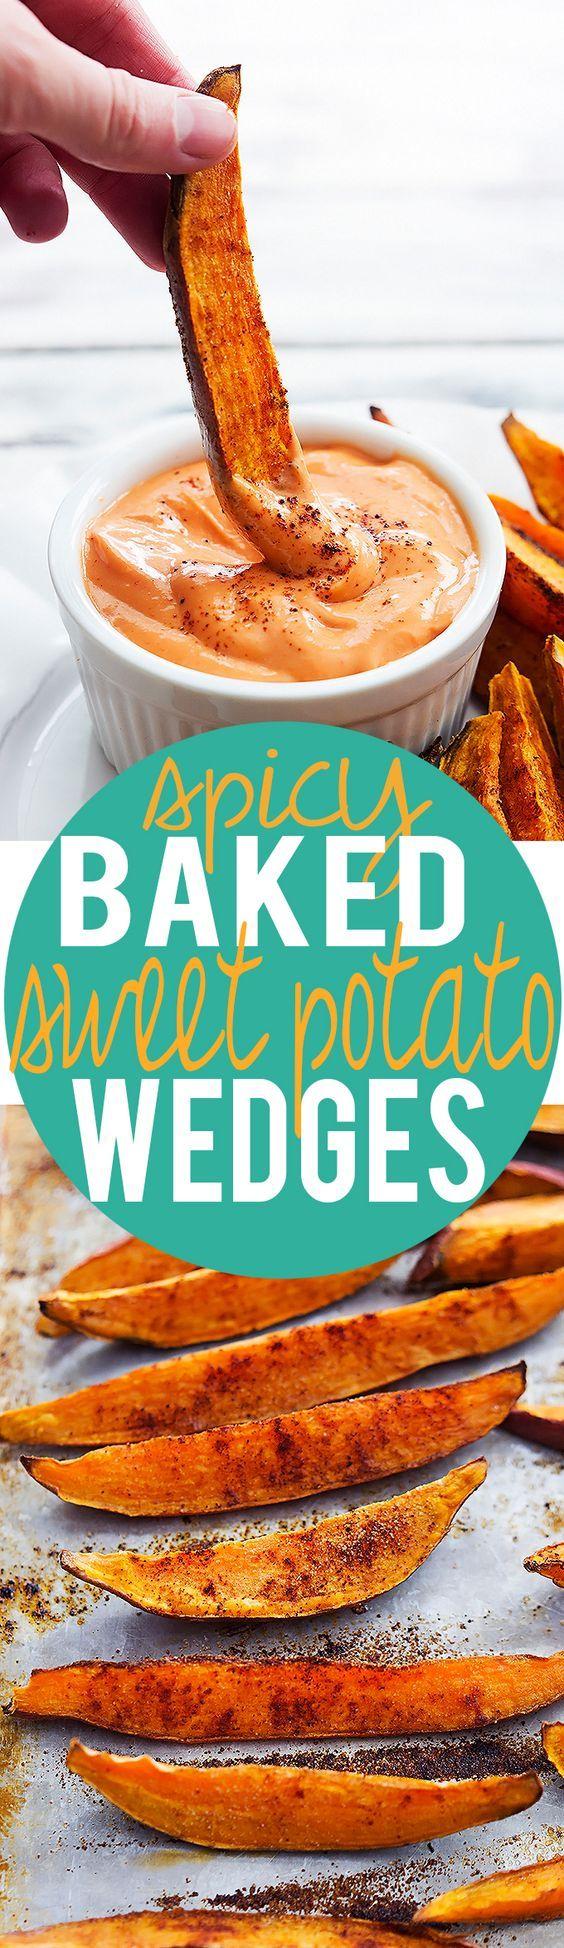 Spicy Baked Sweet Potato Wedges | Creme de la Crumb